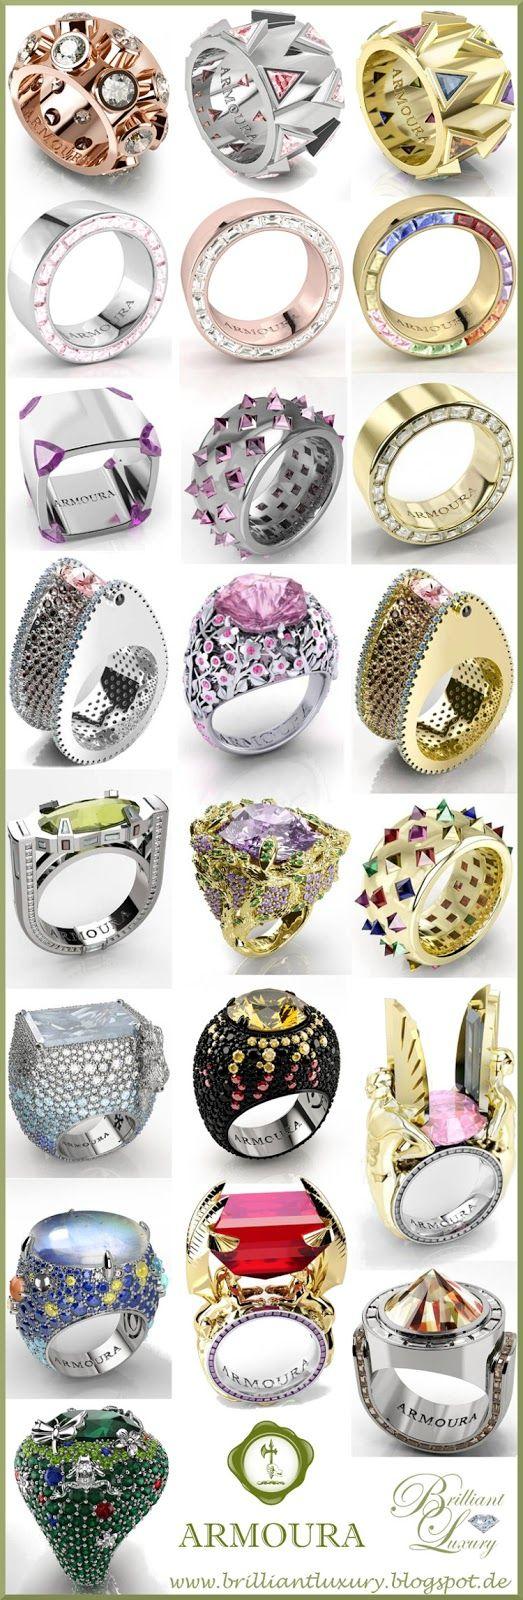 Brilliant Luxury ♦Armoura Fine Jewelry (post 100)